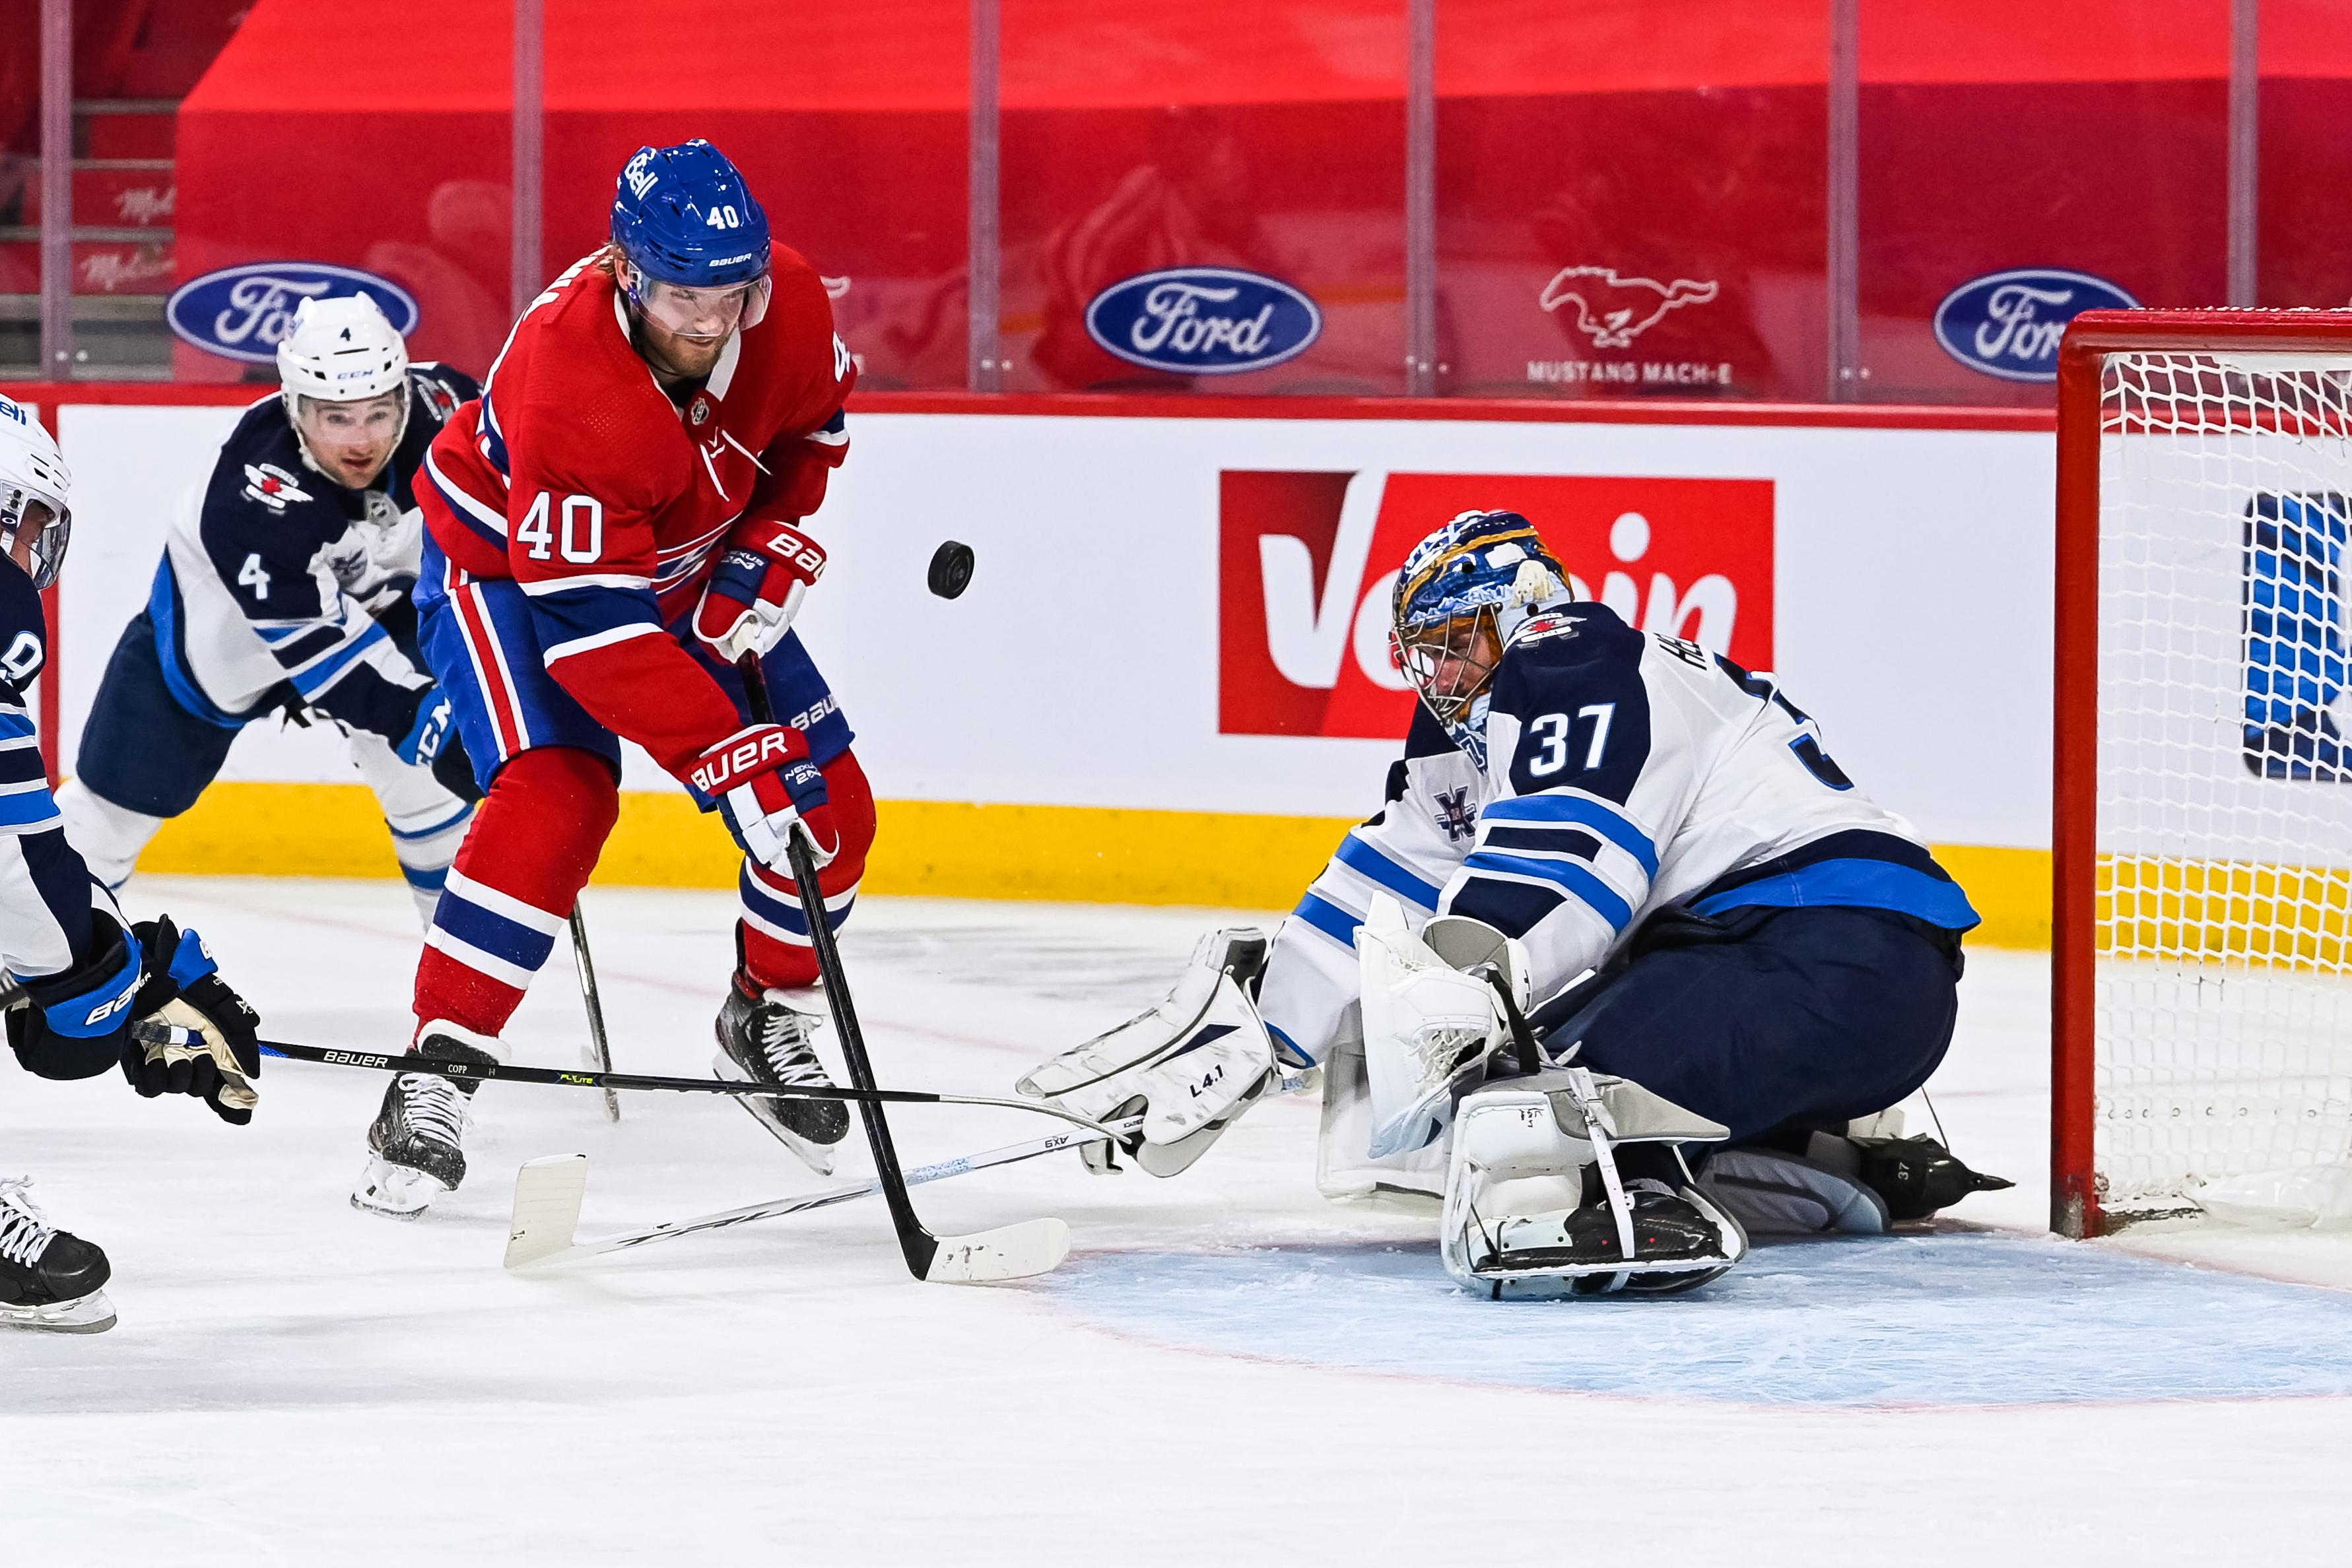 NHL: APR 30 Jets at Canadiens